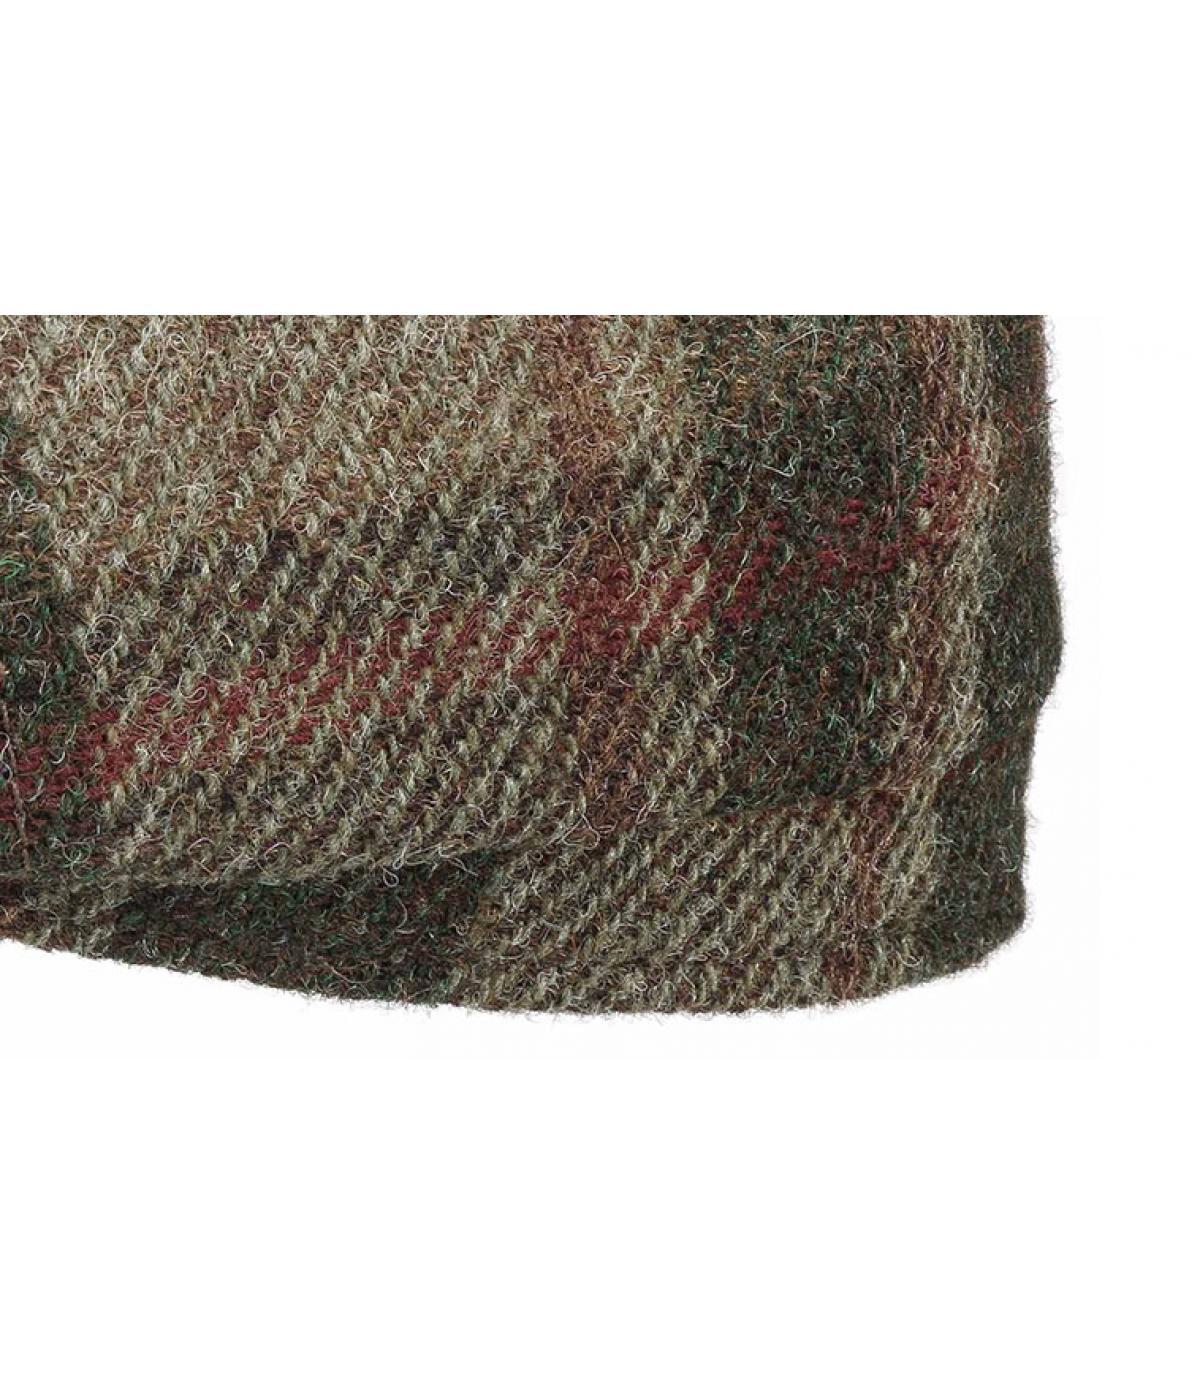 Details Hatteras Virgin Wool check beige olive - afbeeling 3